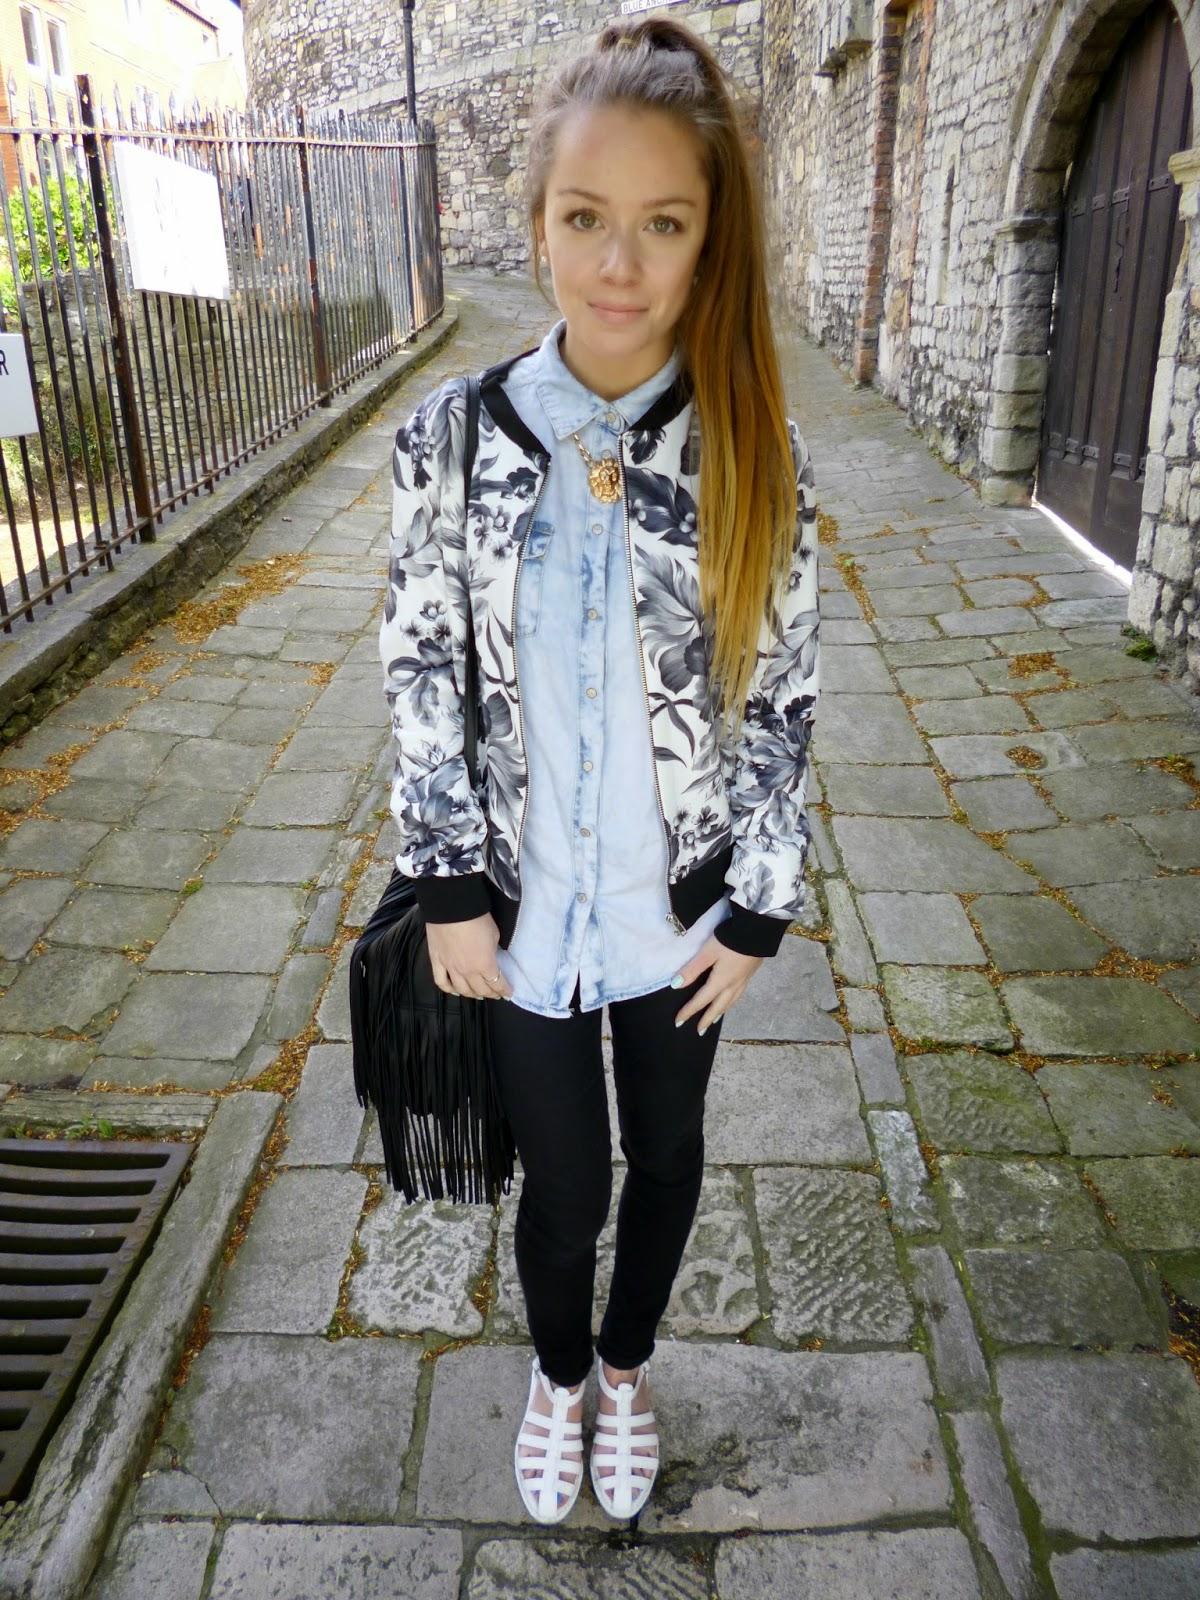 Ootd Floral Bomber Jacket Sleek Chic